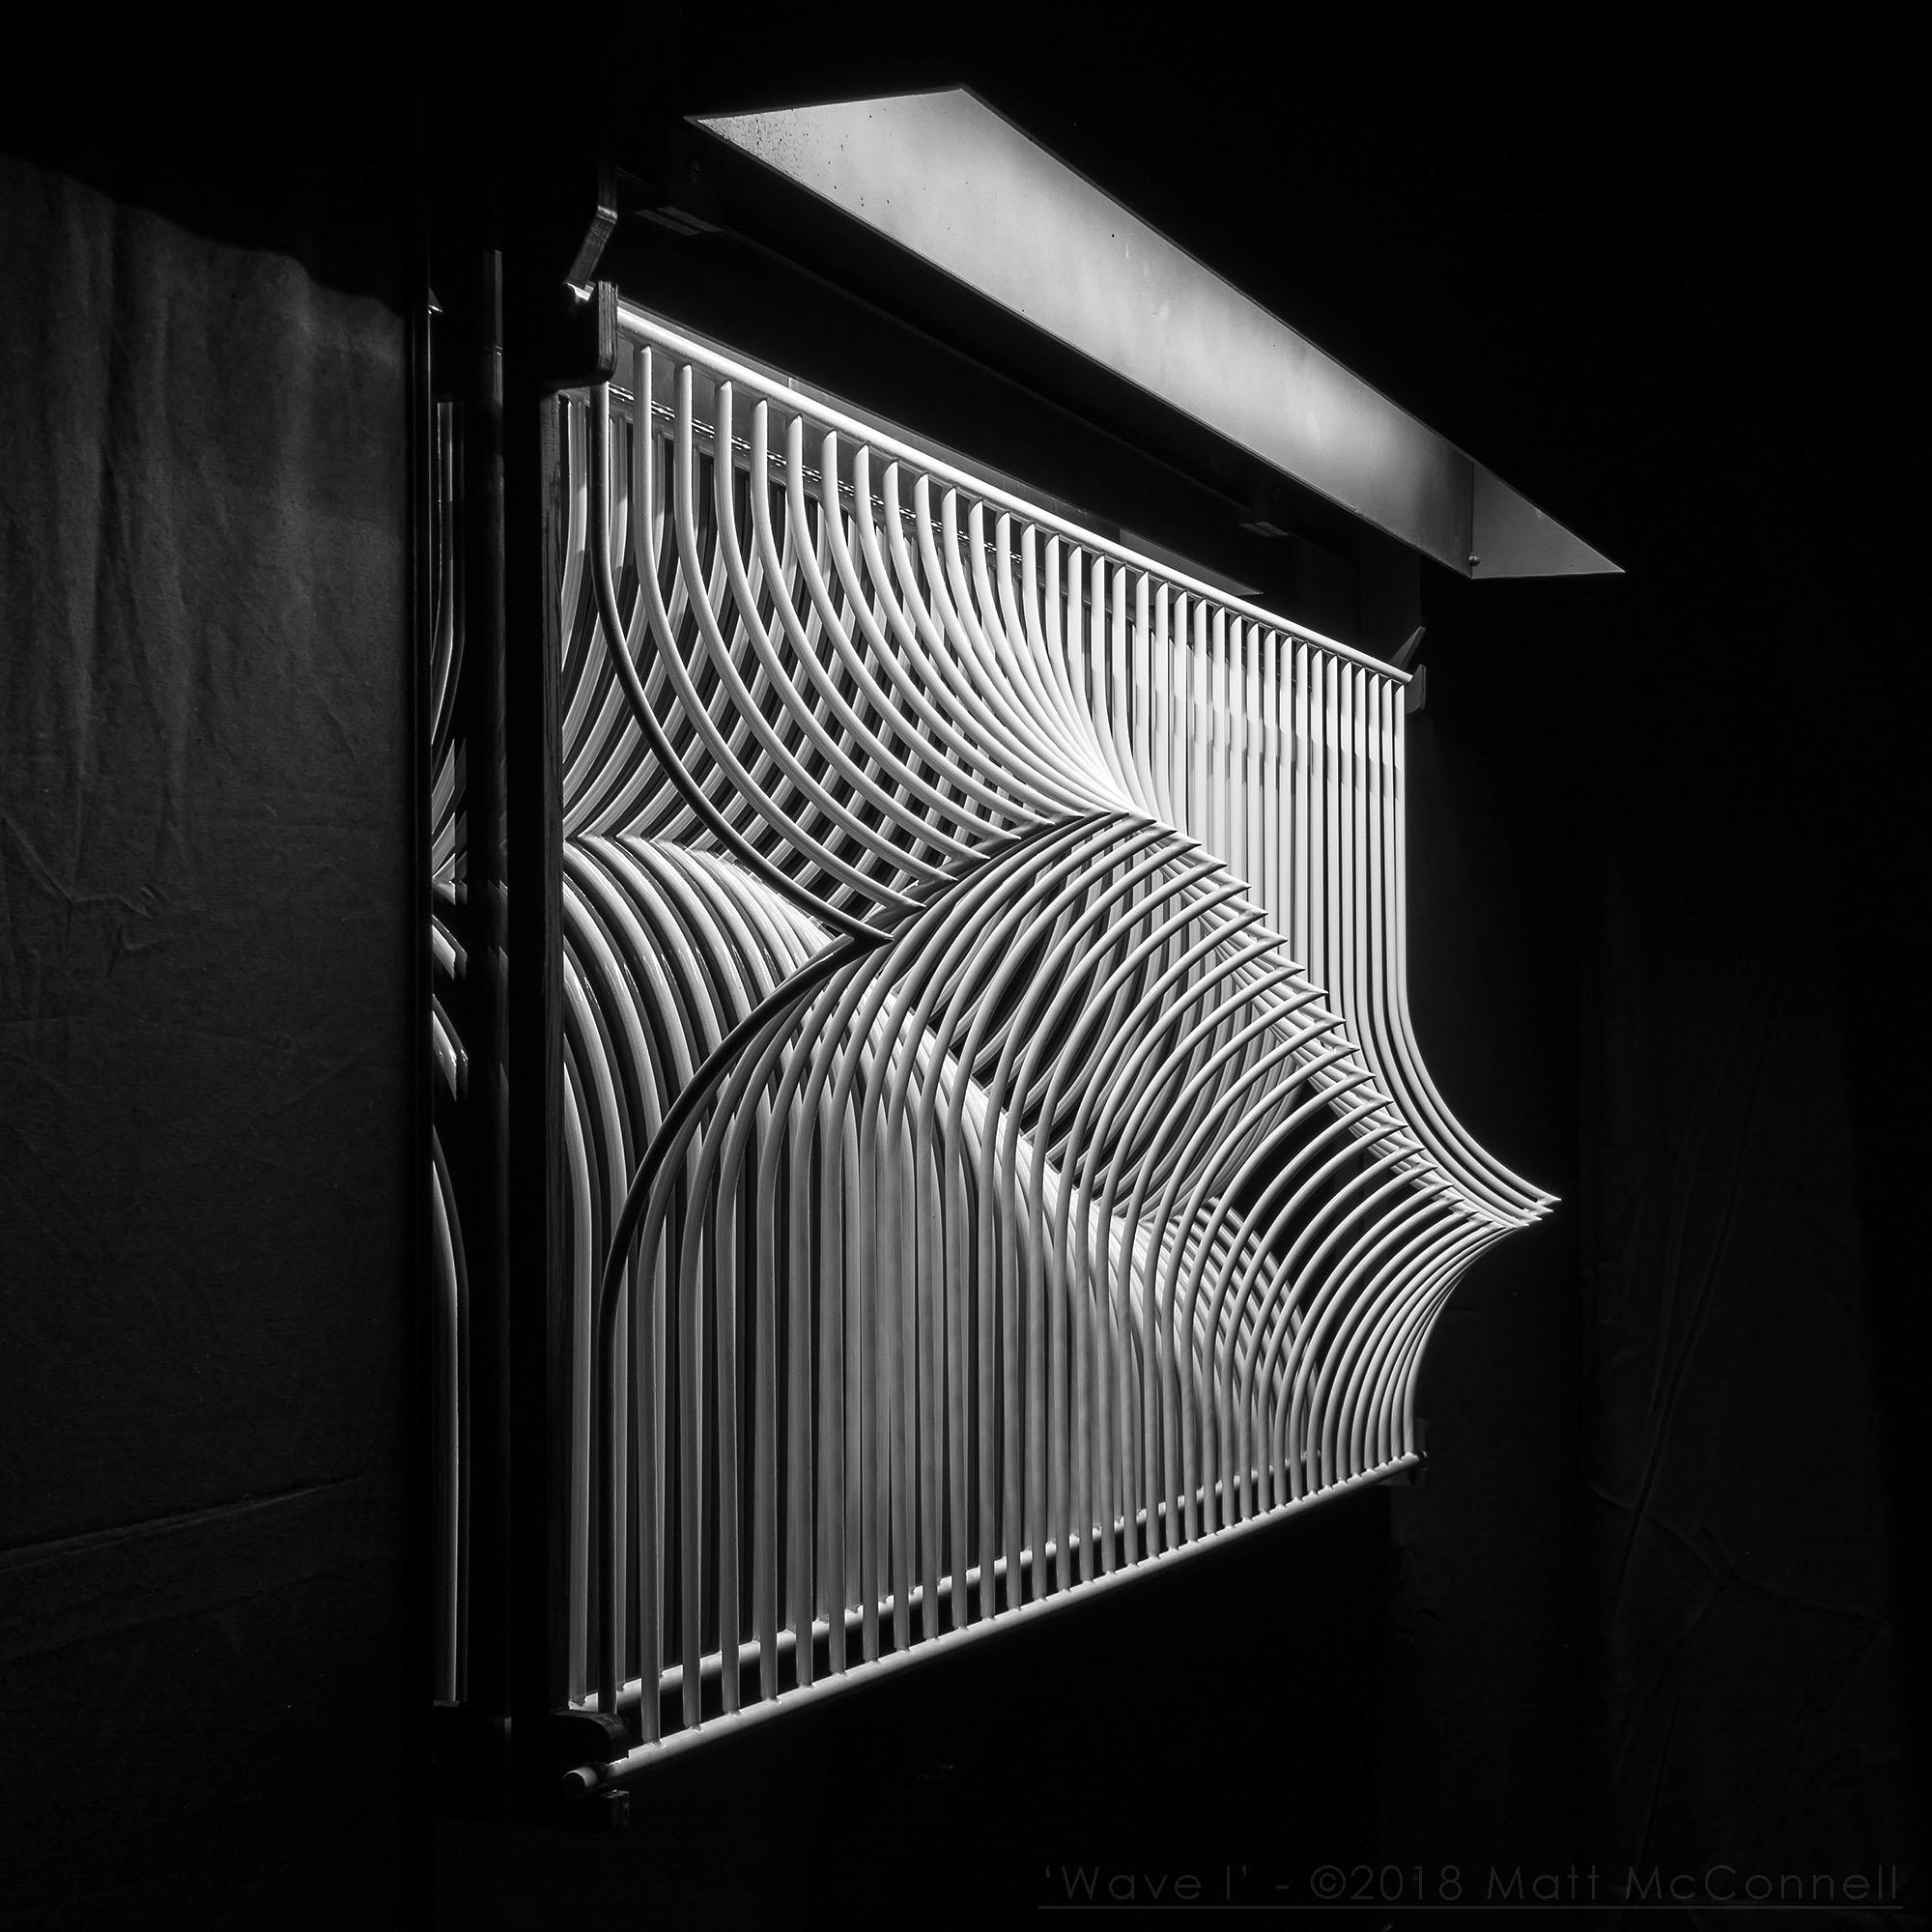 'Wave I-©2018 Matt McConnell - 07.jpg